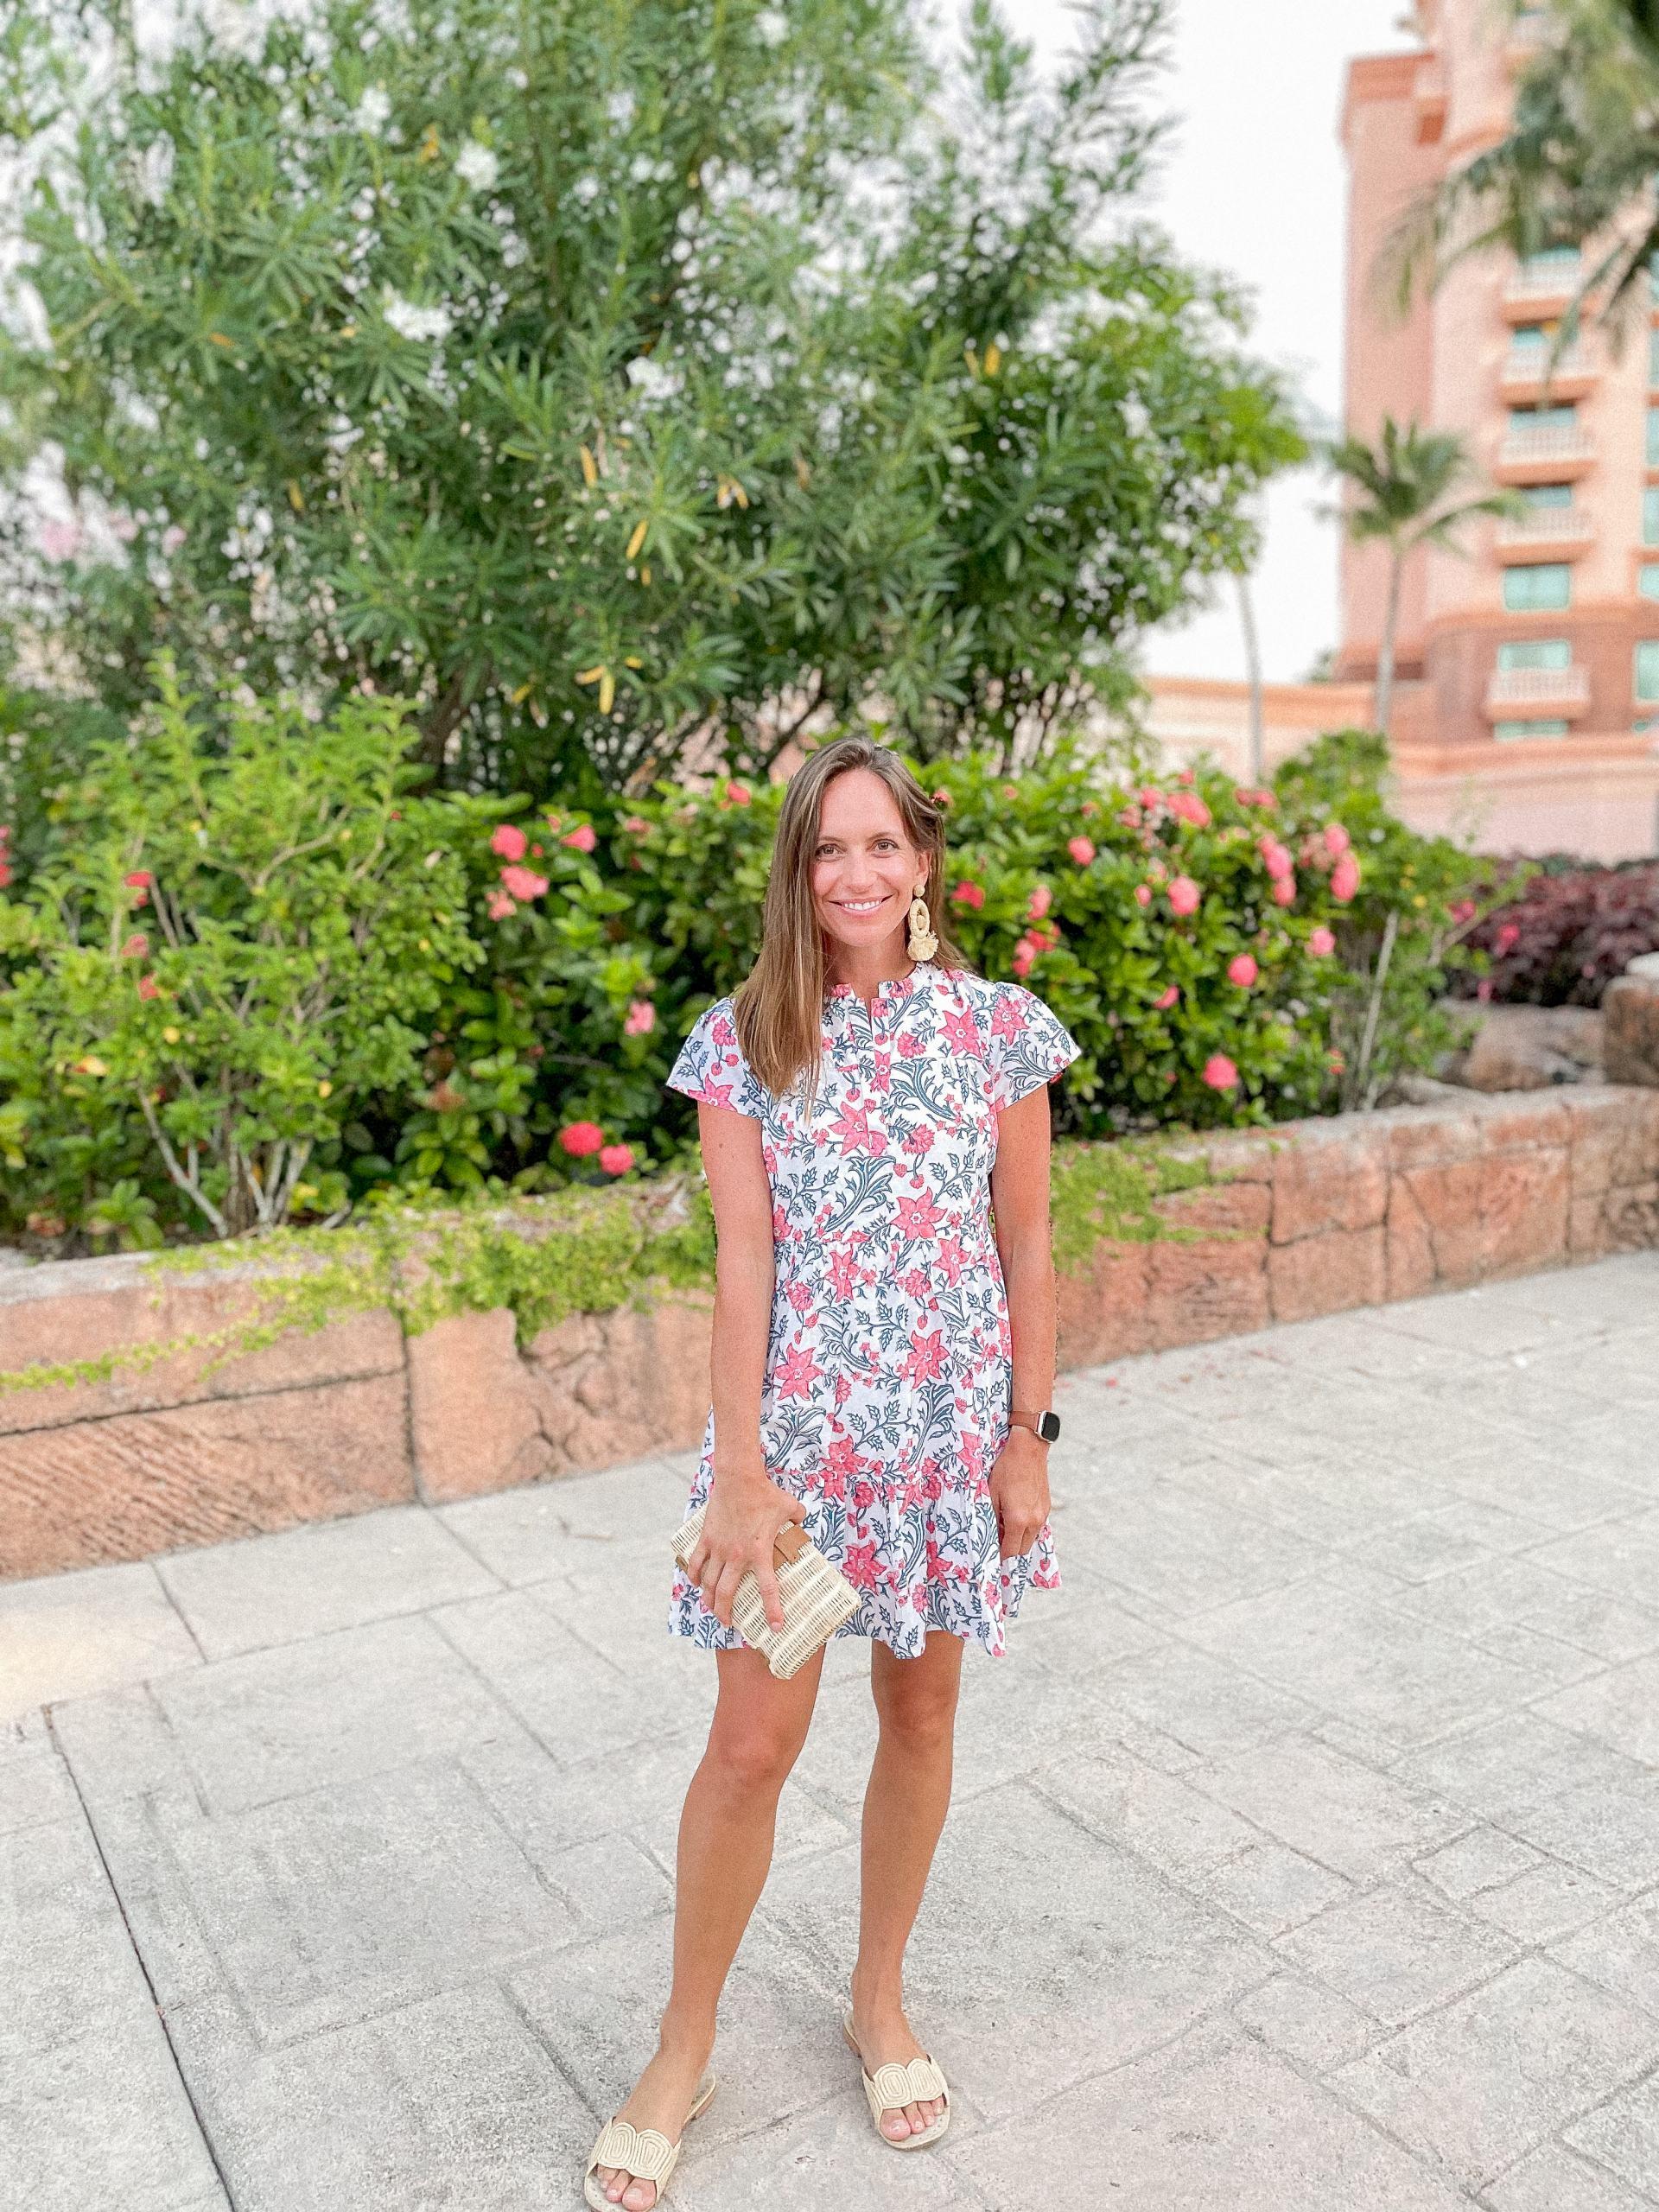 madison mathews dress - folly mini dress - raffia sandals - rattan clutch - classic style - resort style